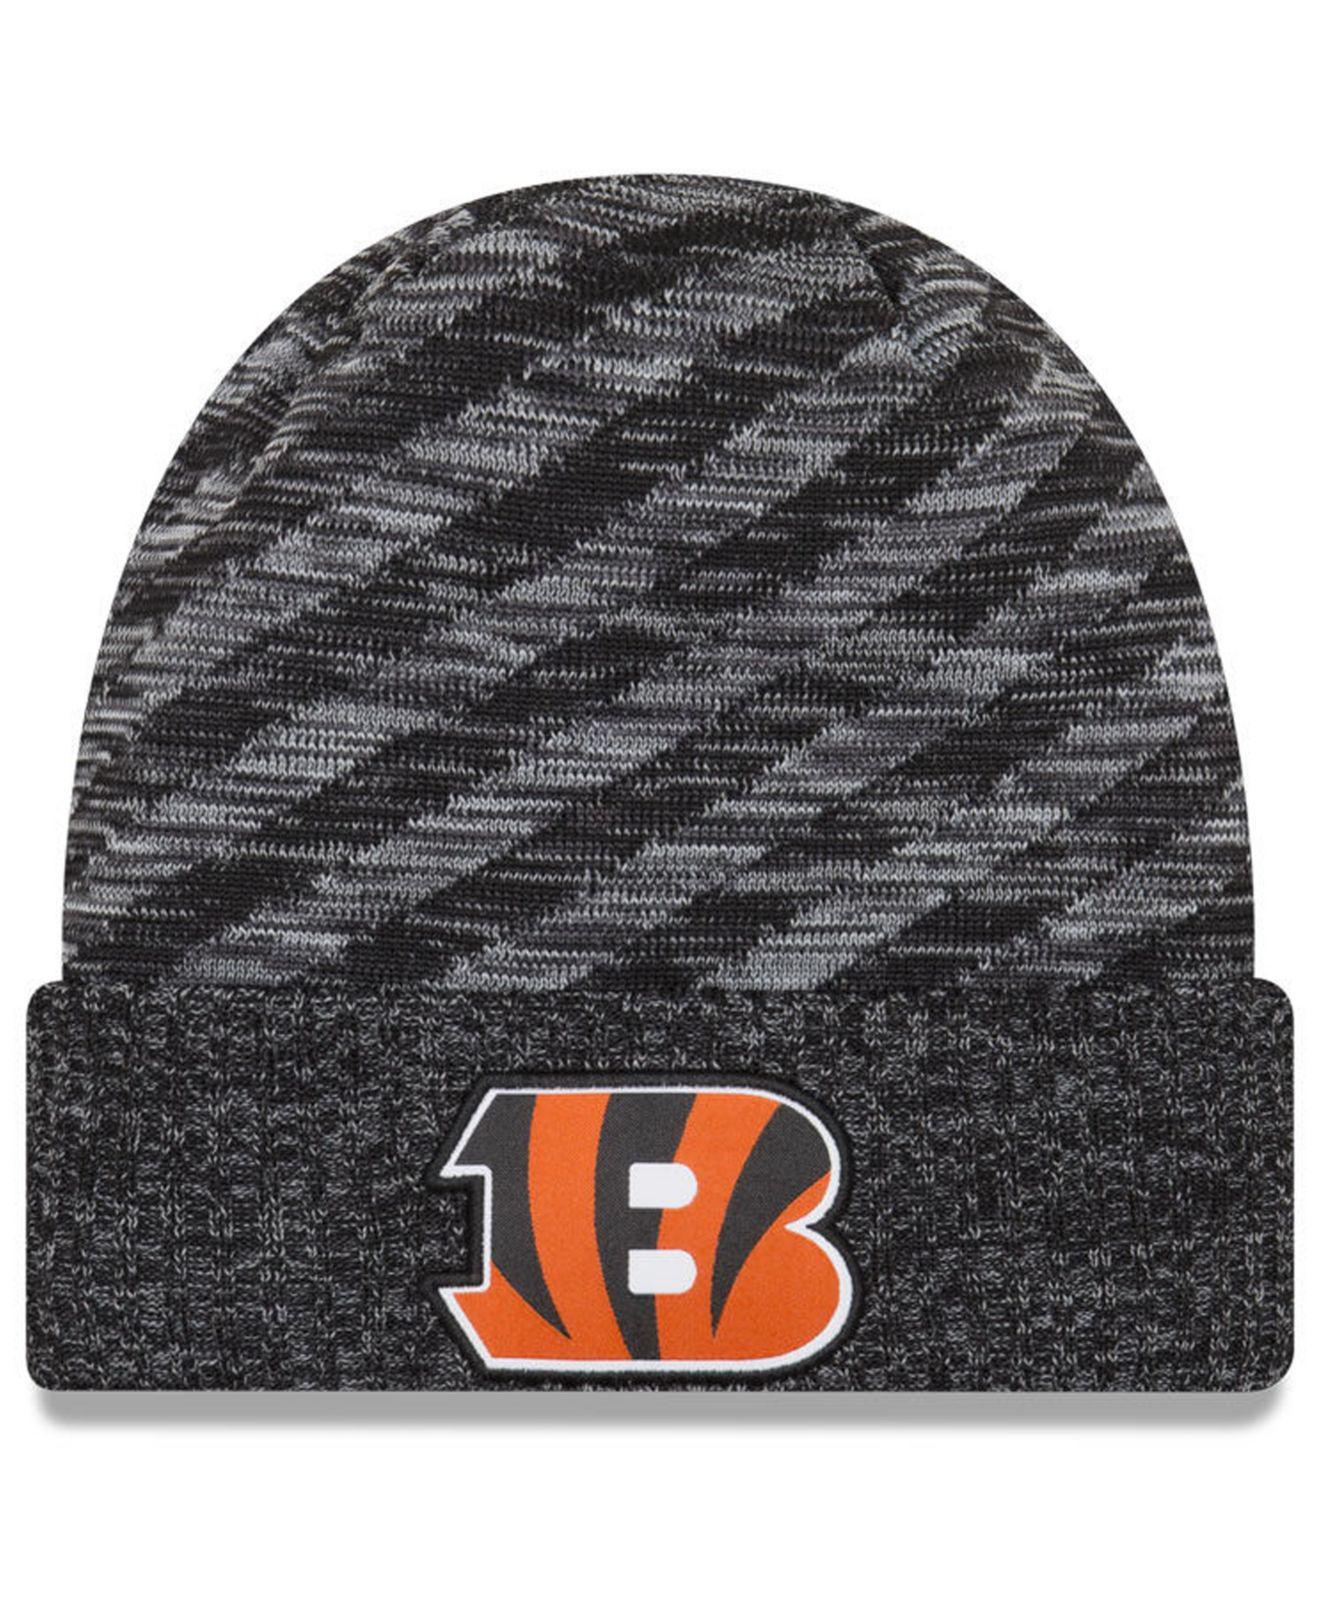 Lyst - KTZ Cincinnati Bengals Touch Down Knit Hat in Black for Men 5ee2ea40f